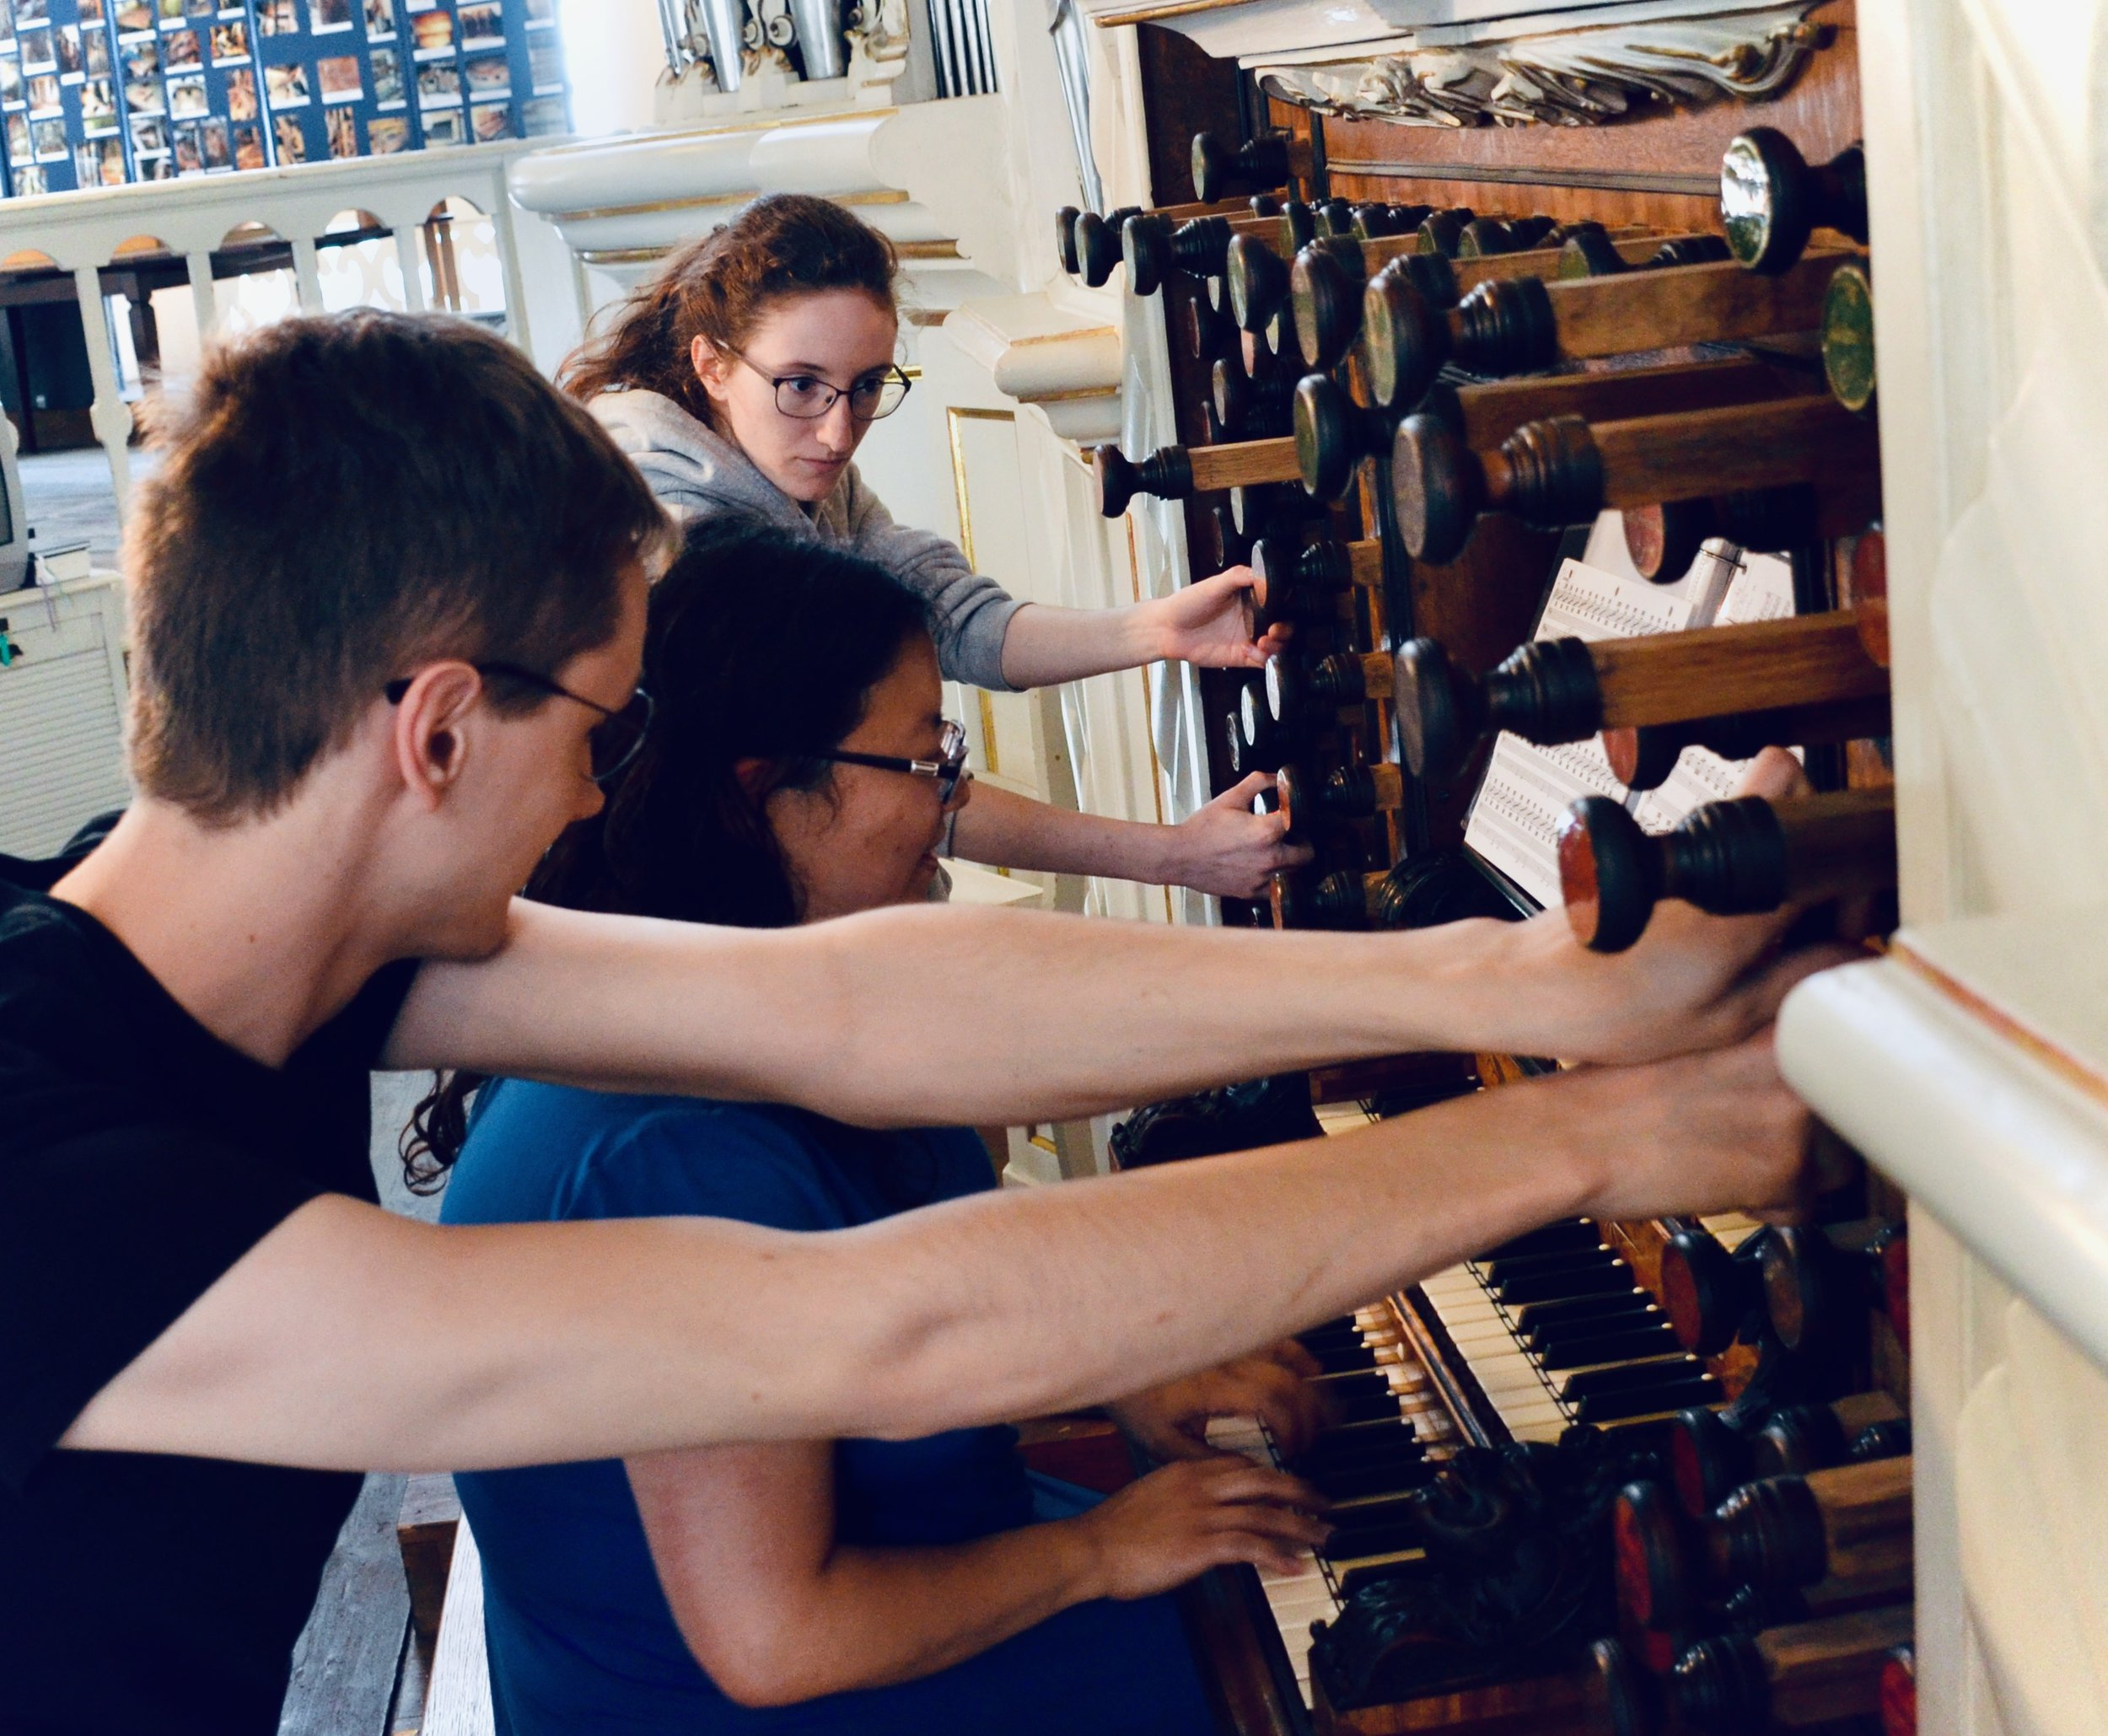 It is hard work pulling stops on the Trost organ in Waltershausen.